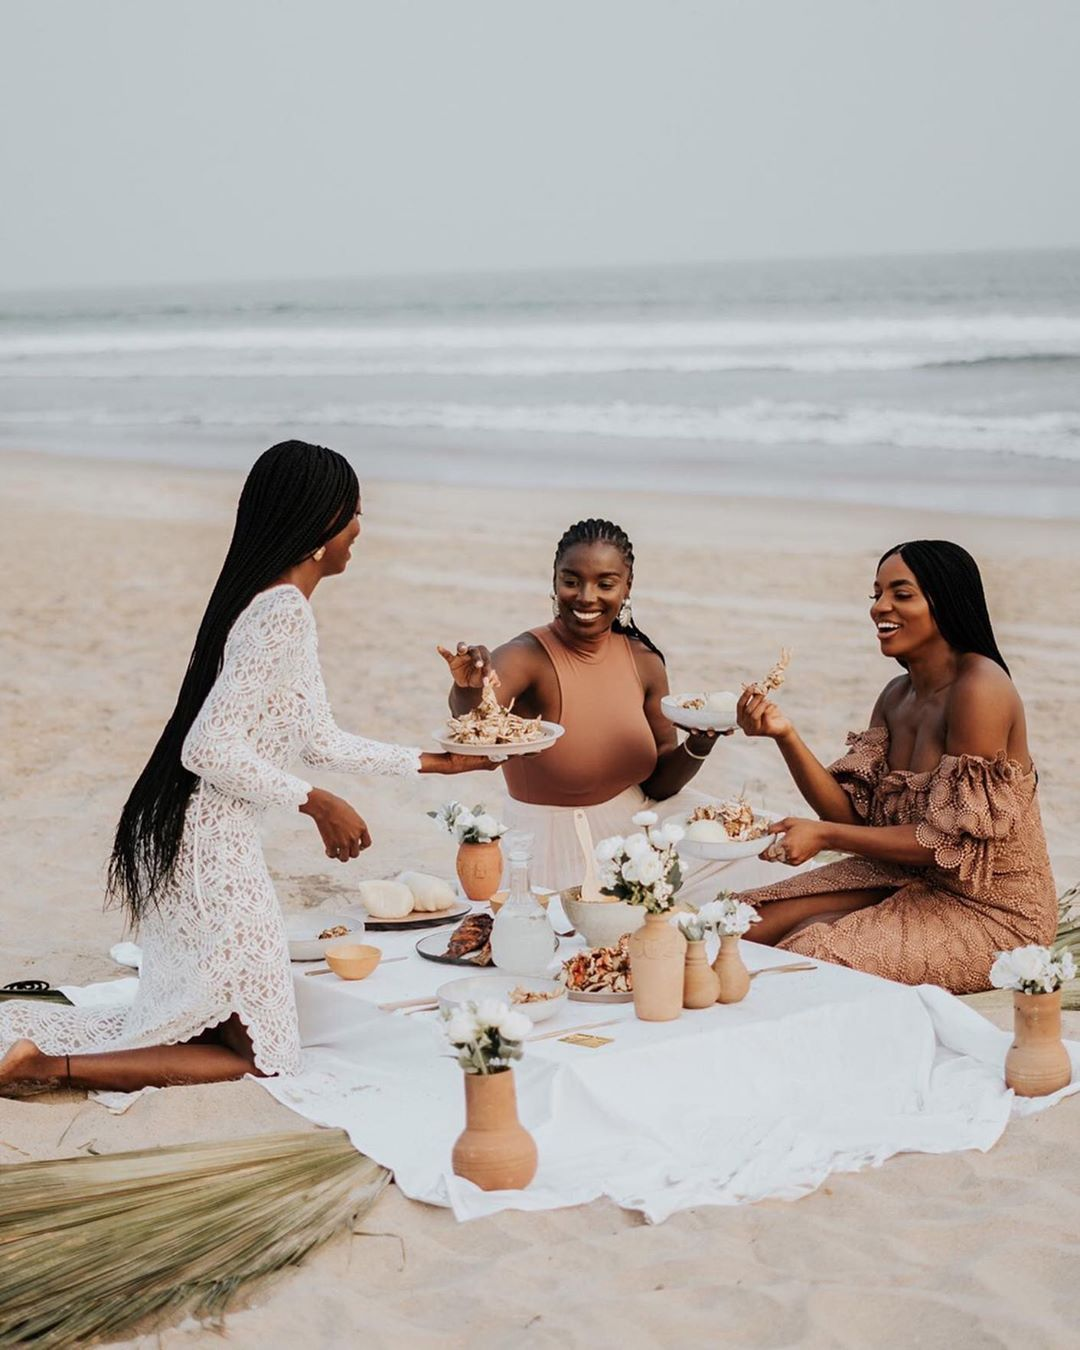 7 Self-care ideas for Black Women